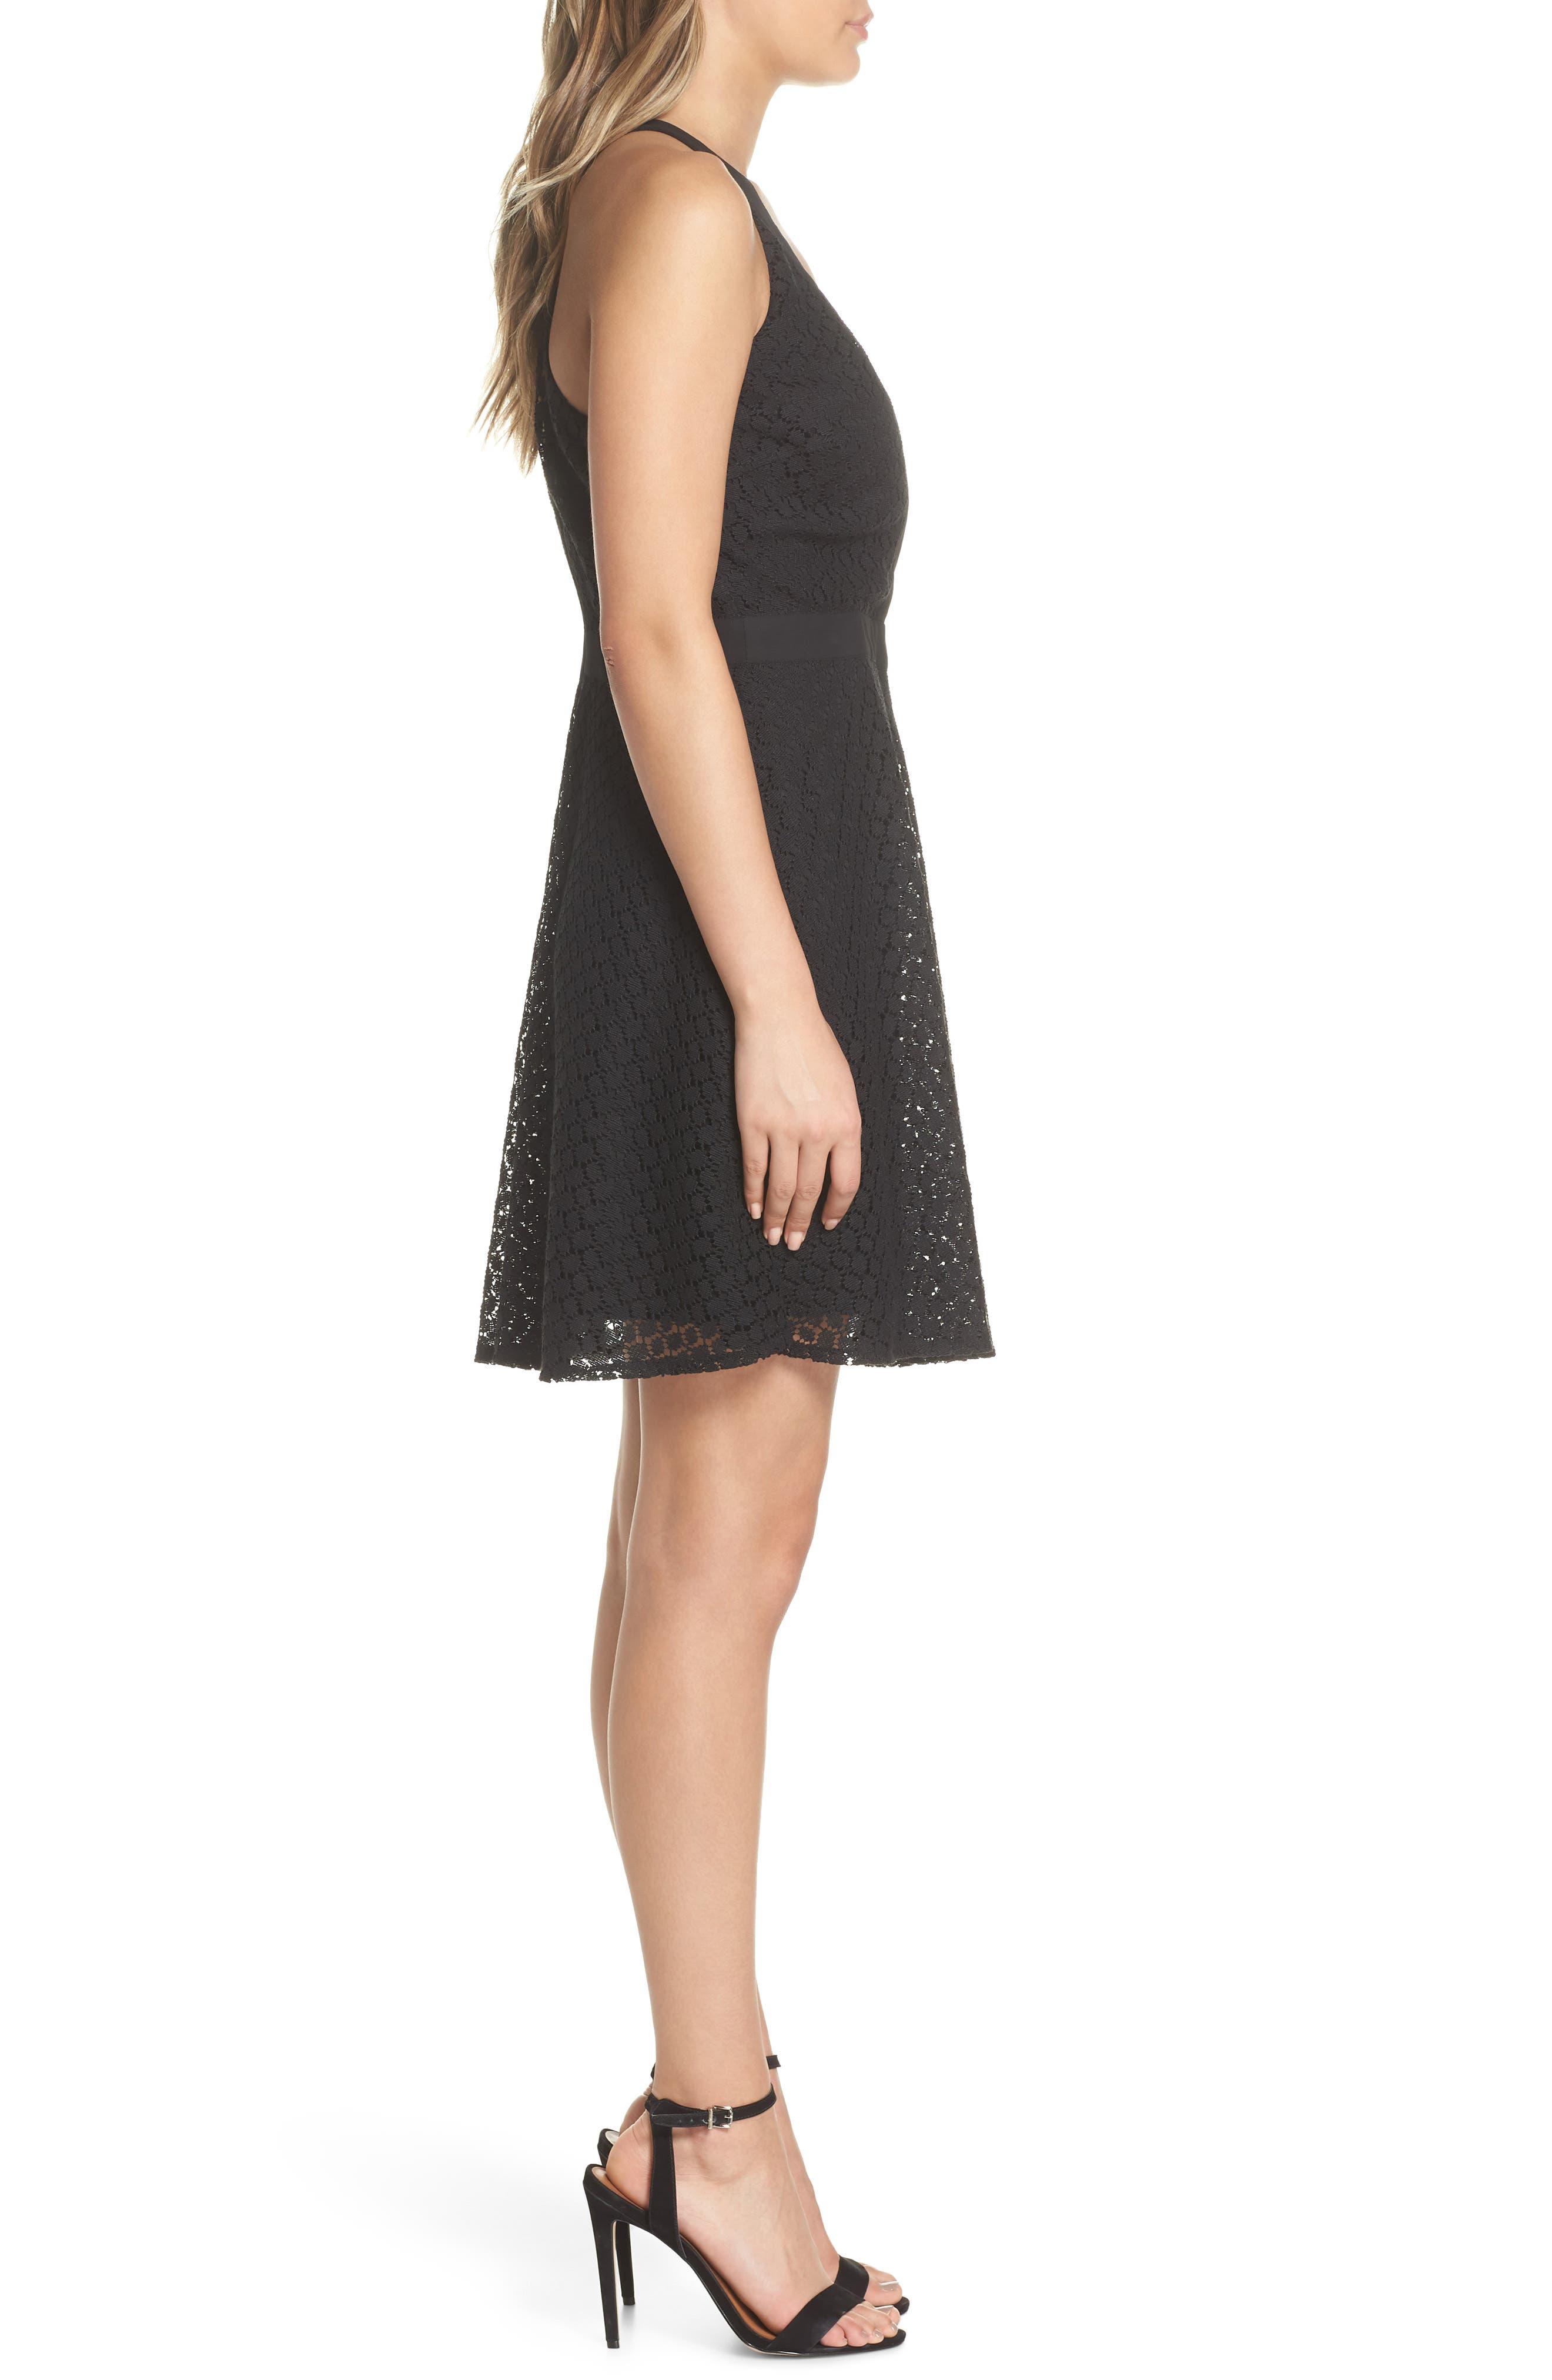 19 COOPER,                             Lace Halter Dress,                             Alternate thumbnail 3, color,                             001